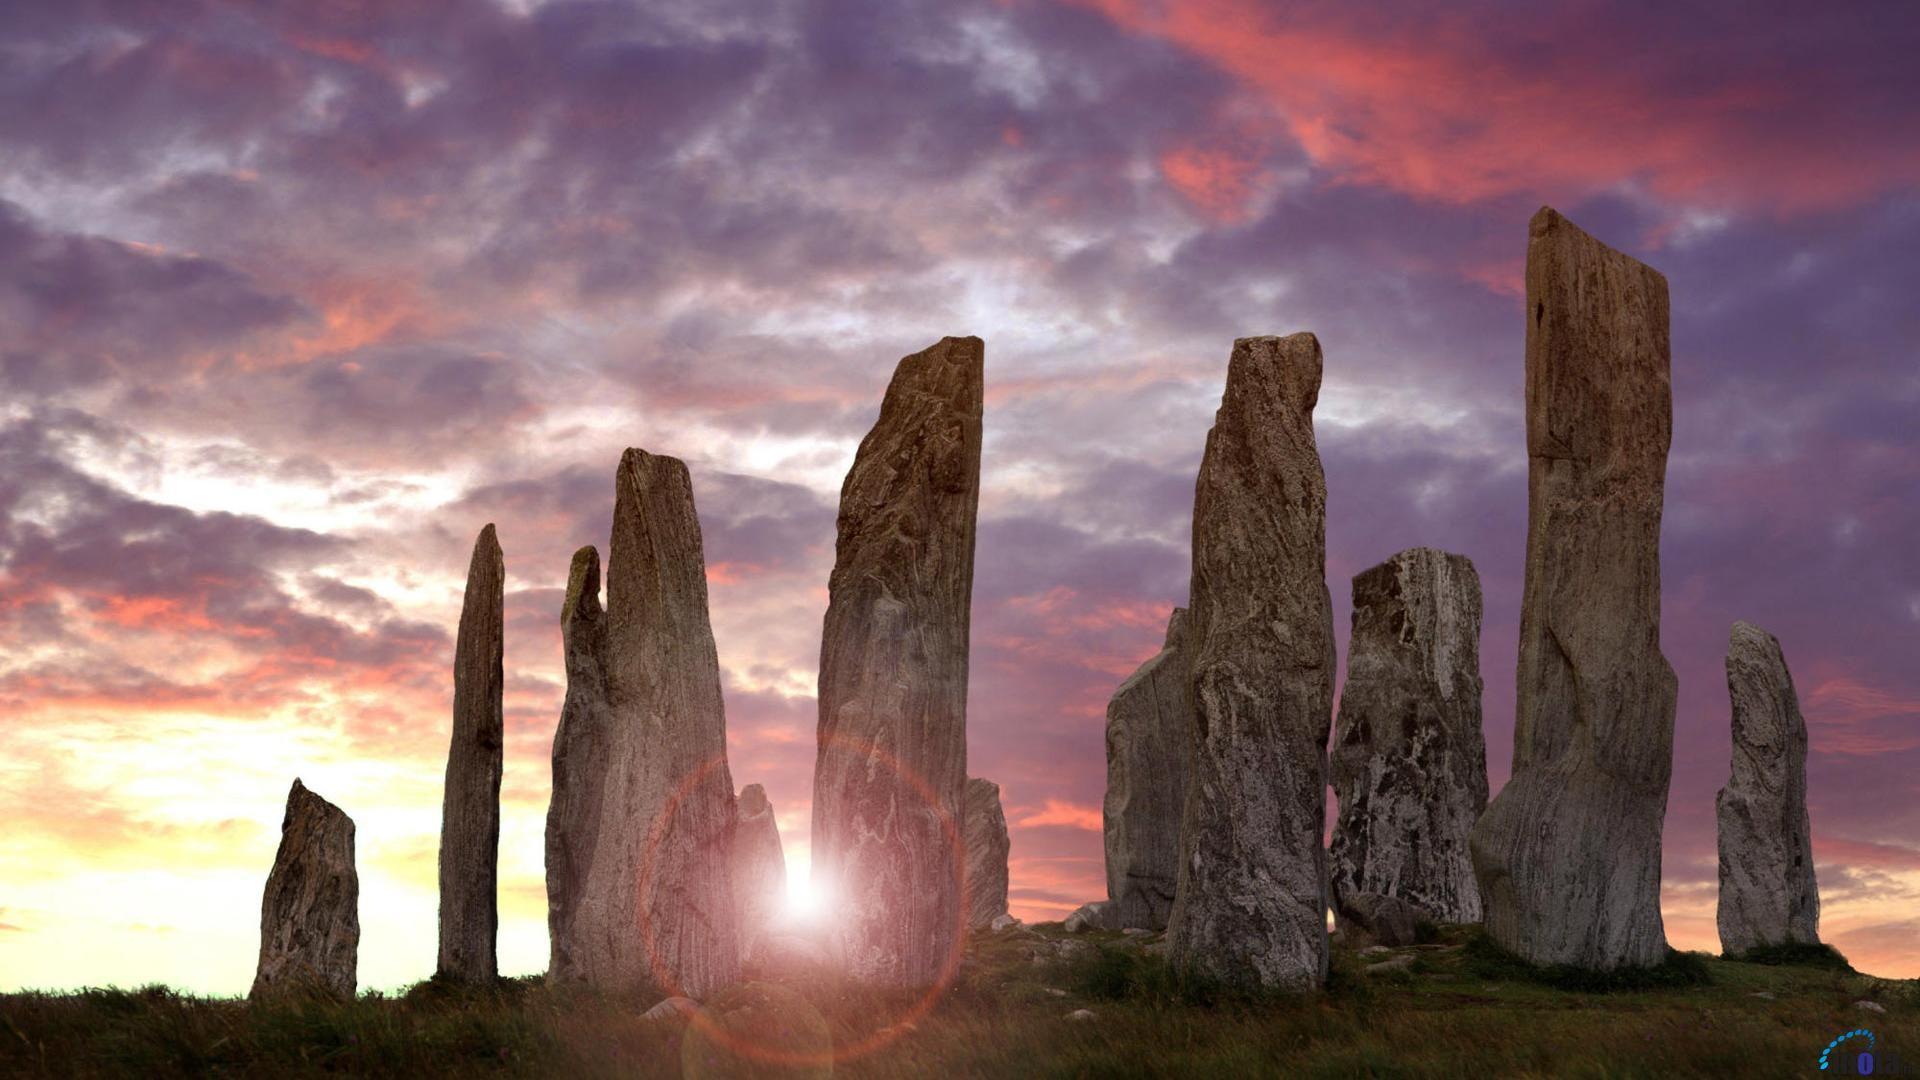 Desktop Wallpapers Callanish Standing Stones Isle Of Lewis Scotland Standing Stone Scotland Wallpaper Outer Hebrides